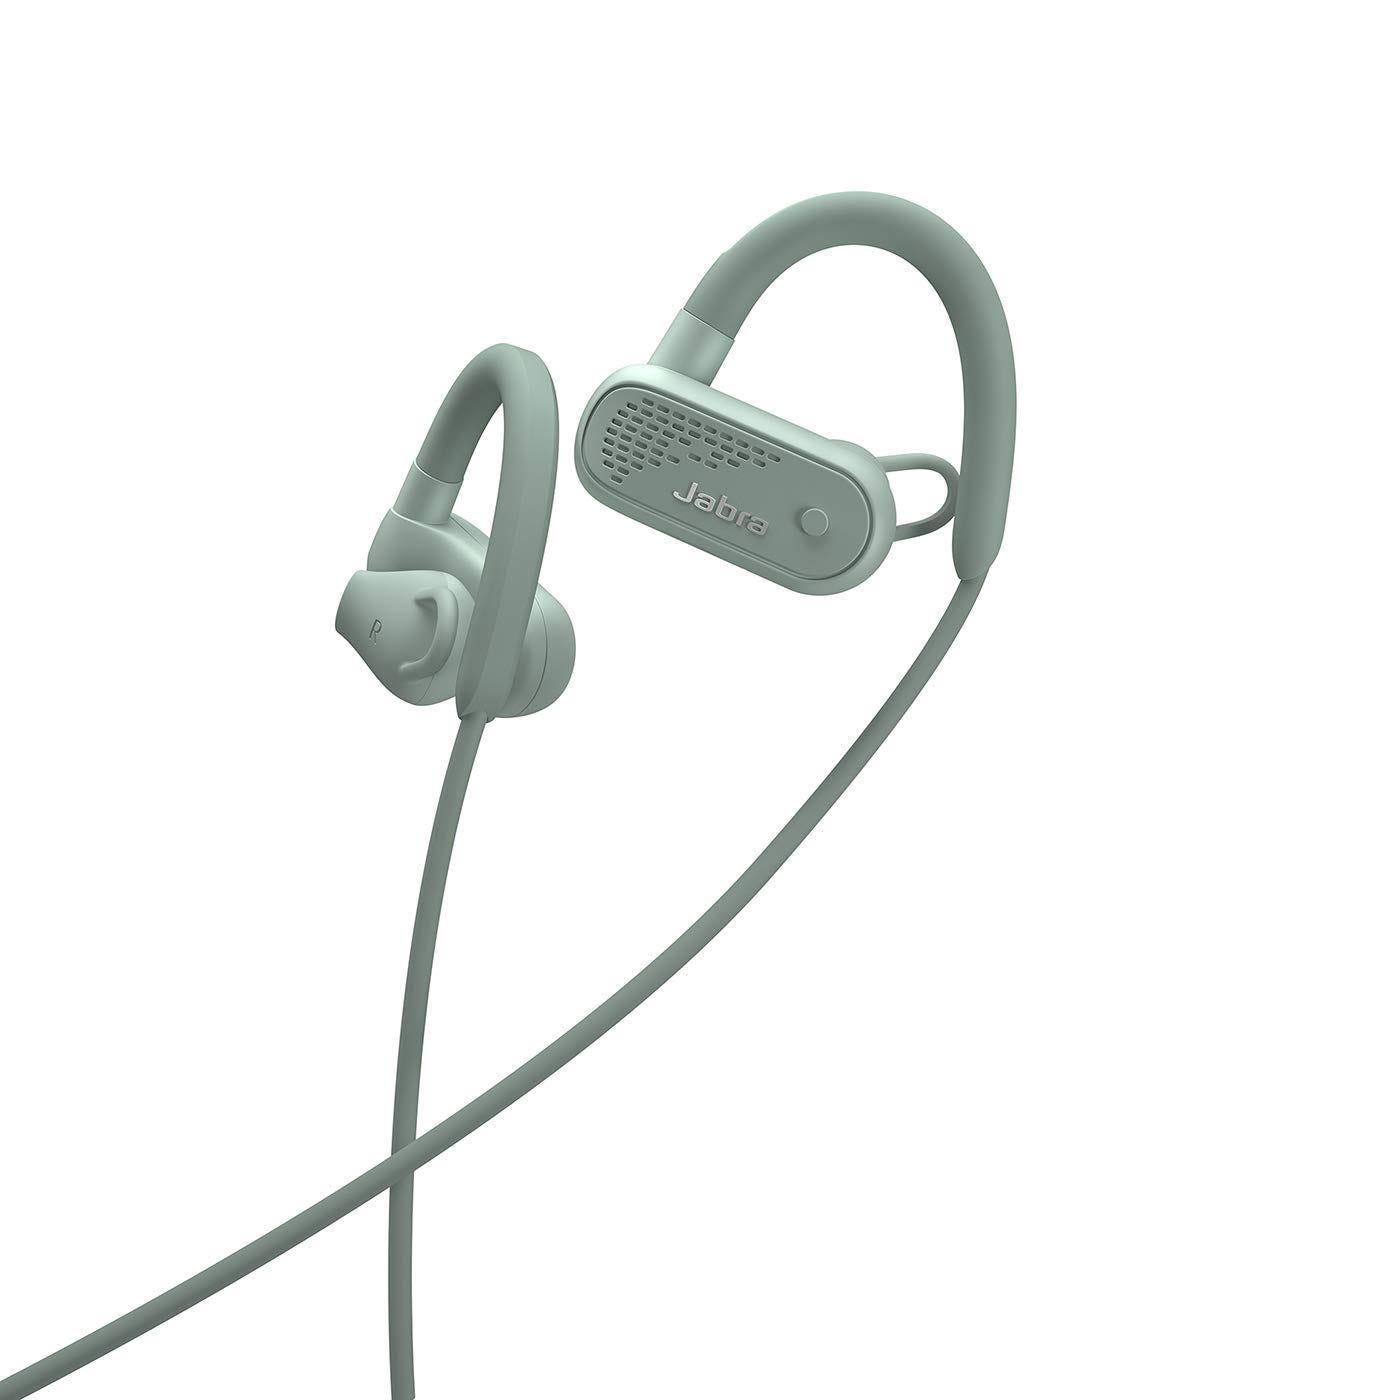 Headset Jack Wiring - Wiring Diagrams on